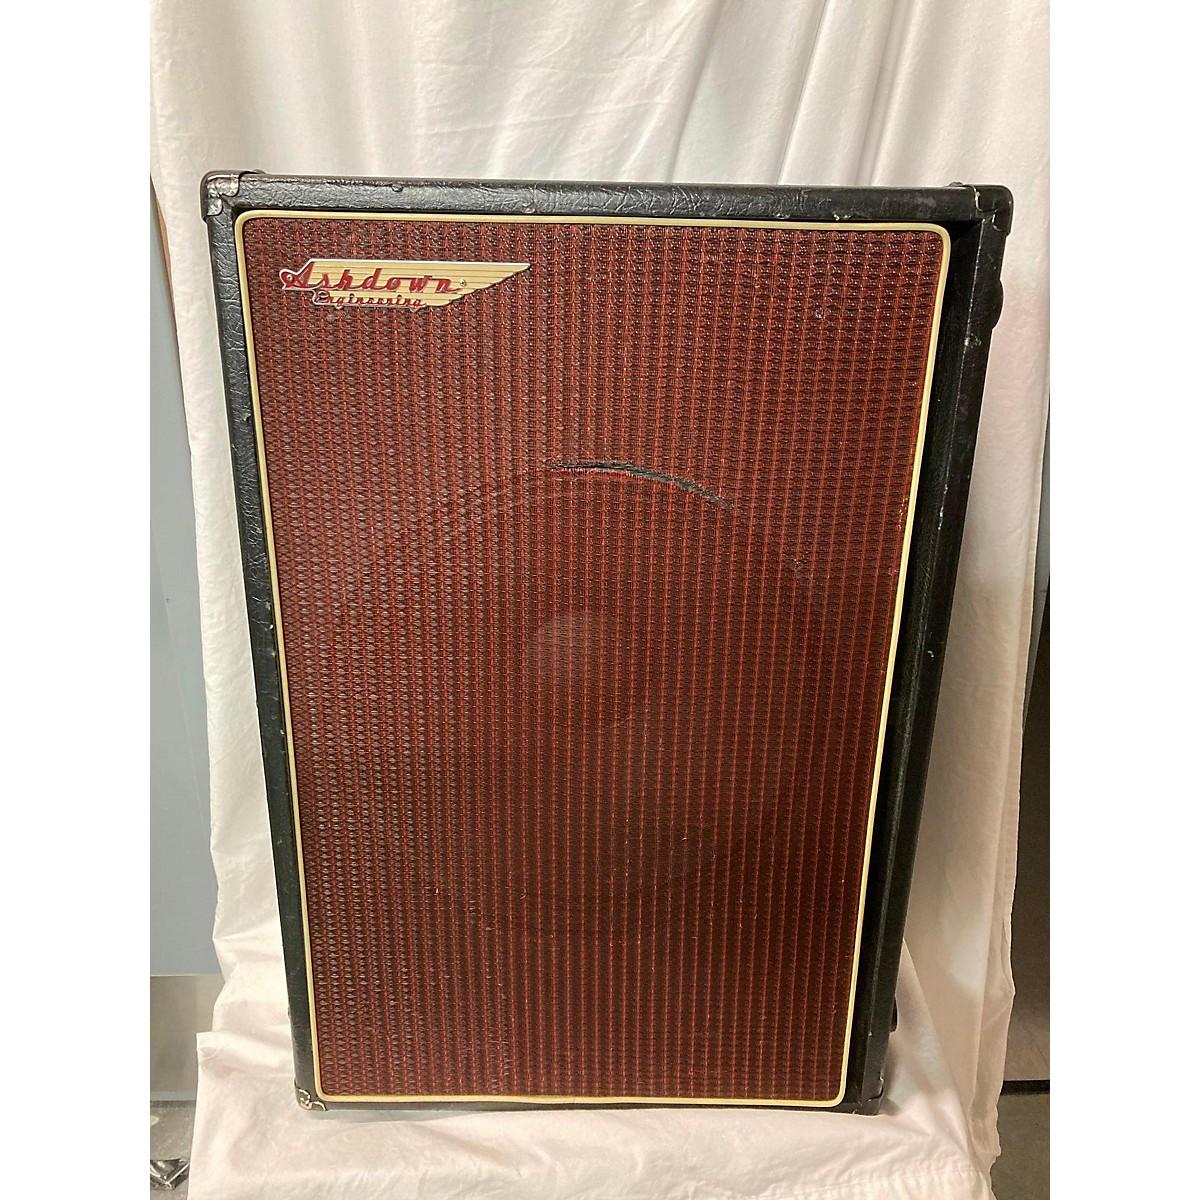 Ashdown VS115 Bass Cabinet